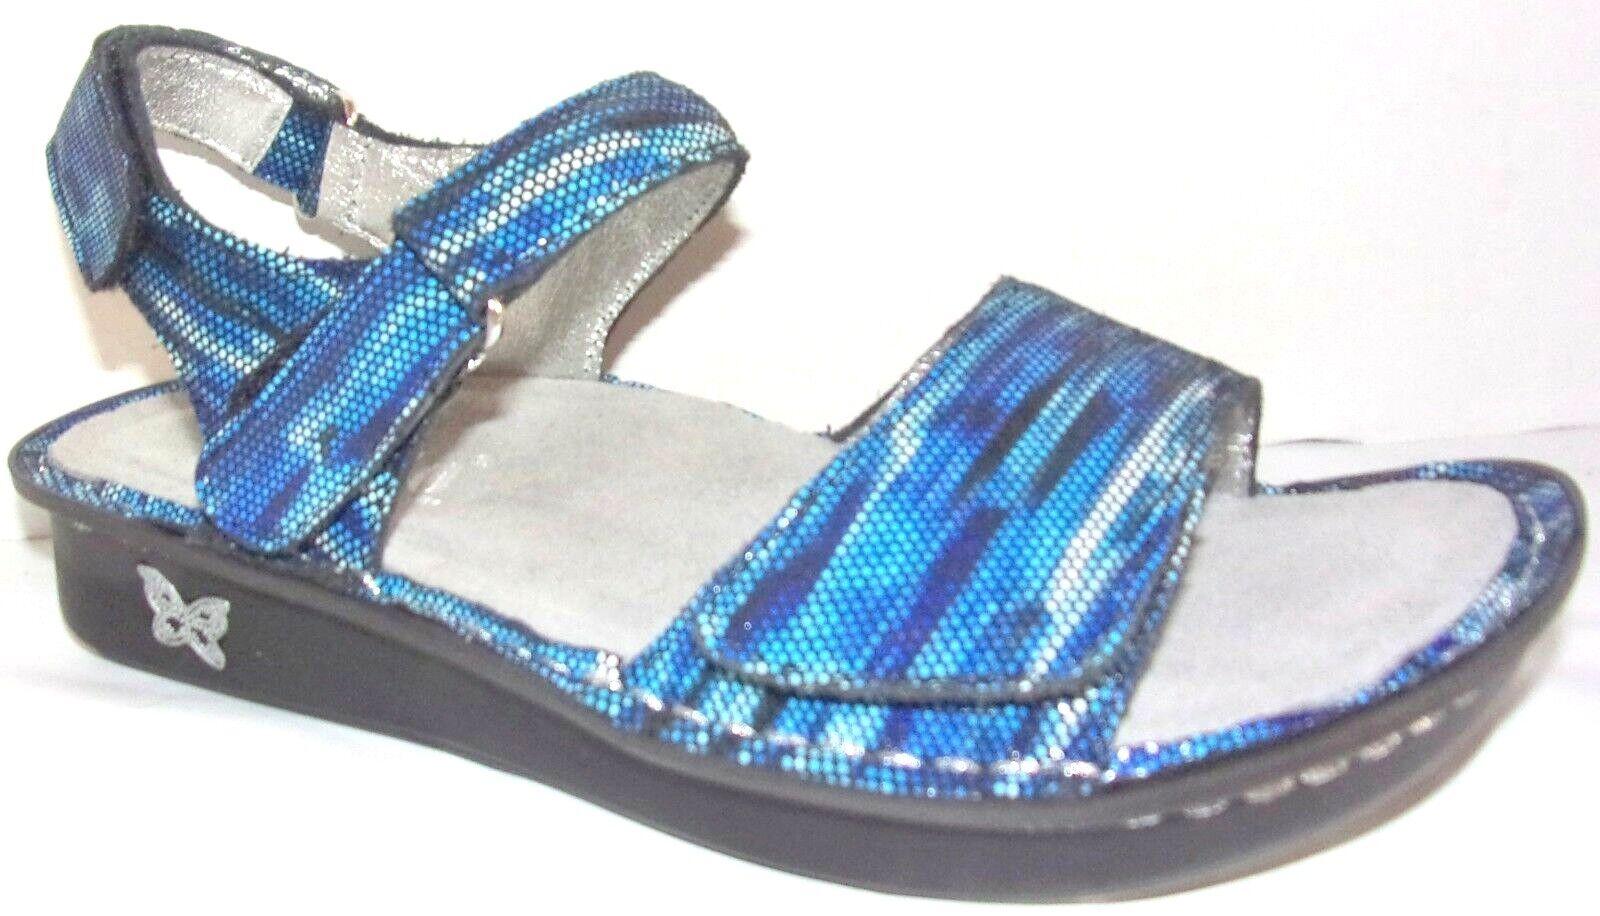 New Alegria Patti Wavy Navy Leather Comfort Slide Sandals M